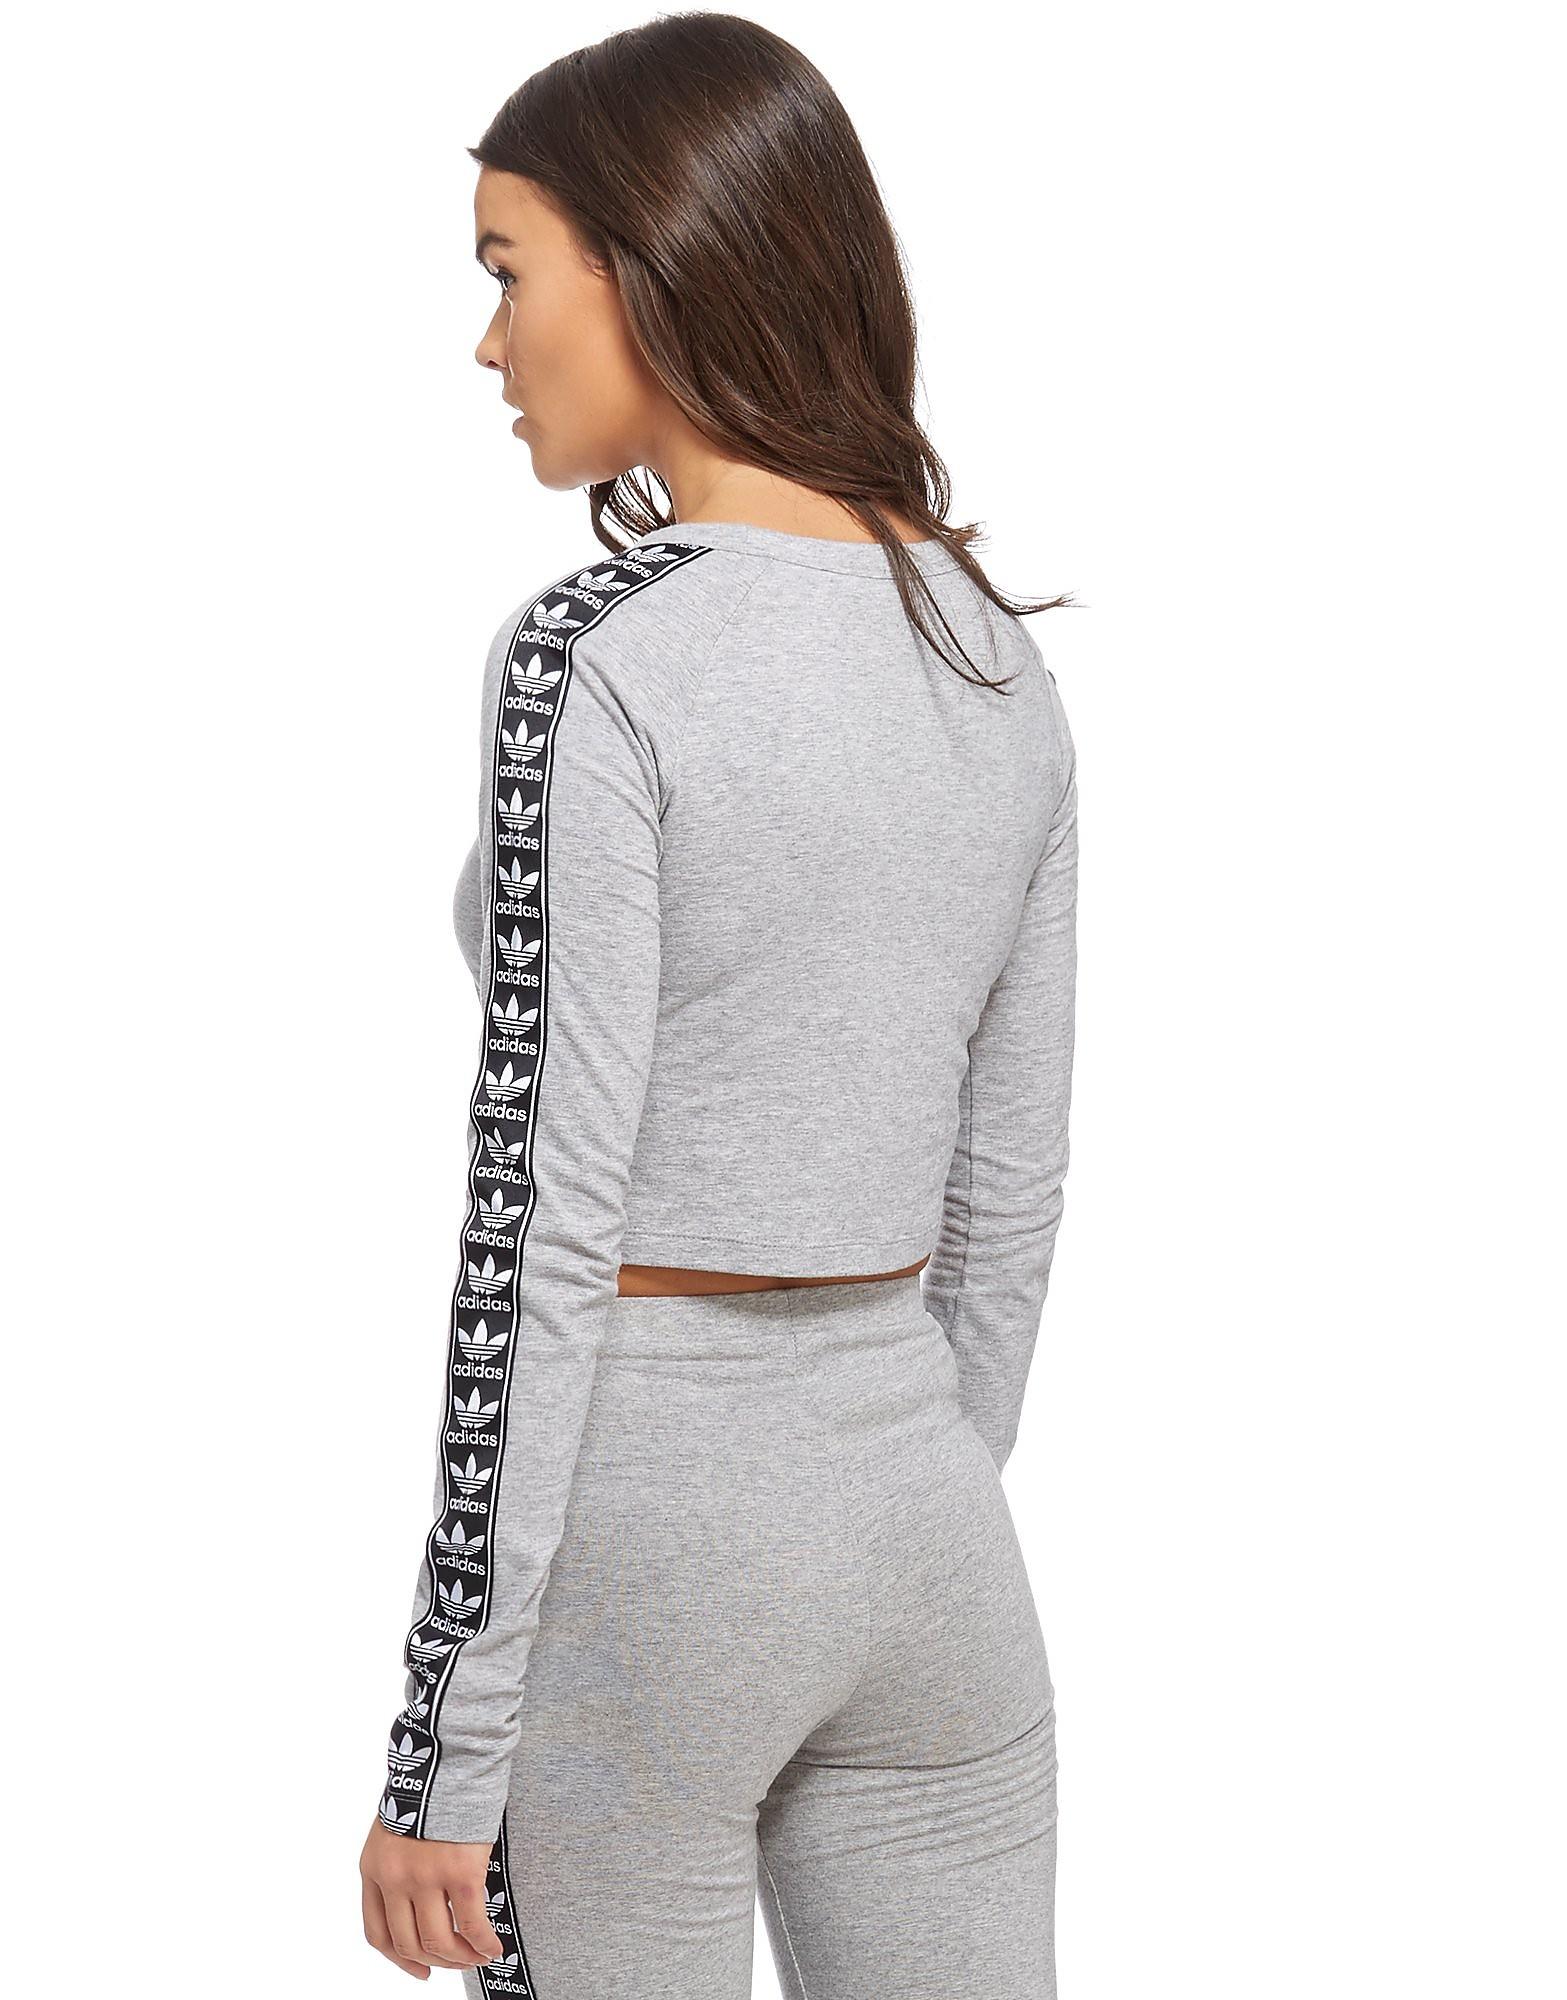 adidas Originals Tape Longsleeve Crop T-Shirt